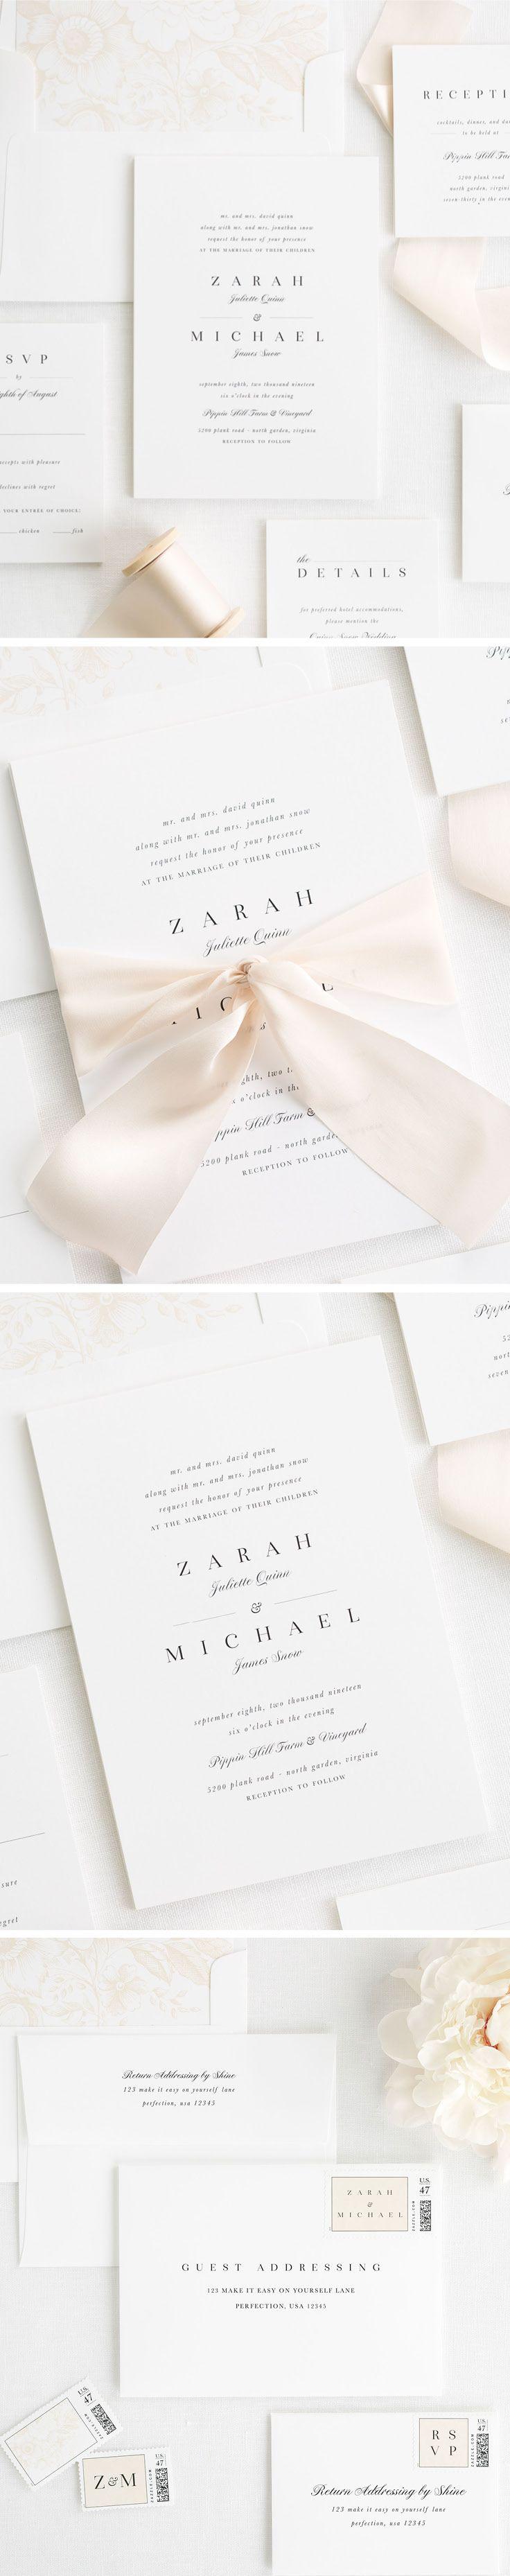 Zarah Ribbon Wedding Invitations | Unique wedding invitation ...